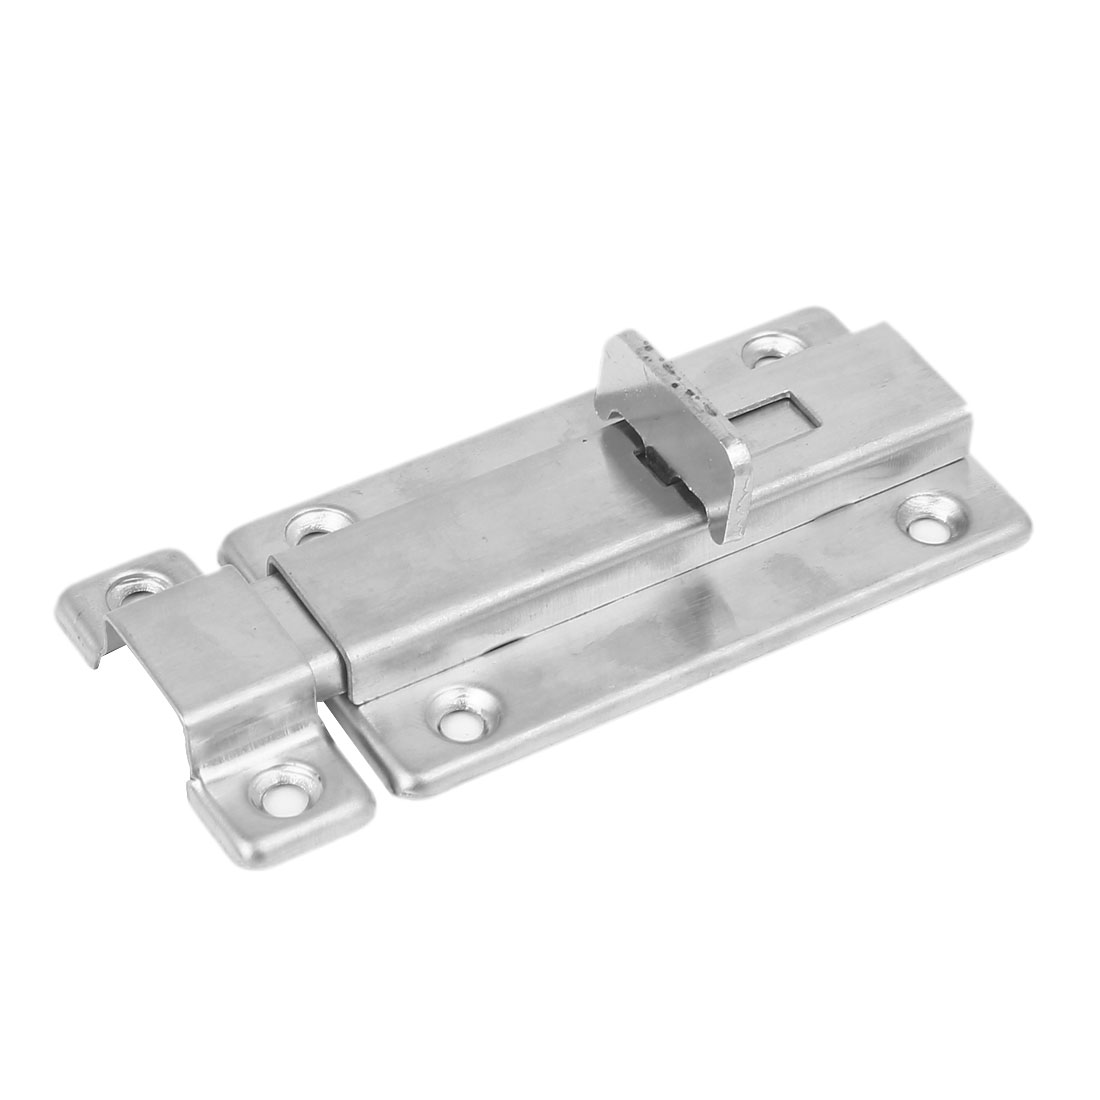 90mmx40mmx10mm Door Security Lock Latch Barrel Bolt Hasp Stapler Silver Tone